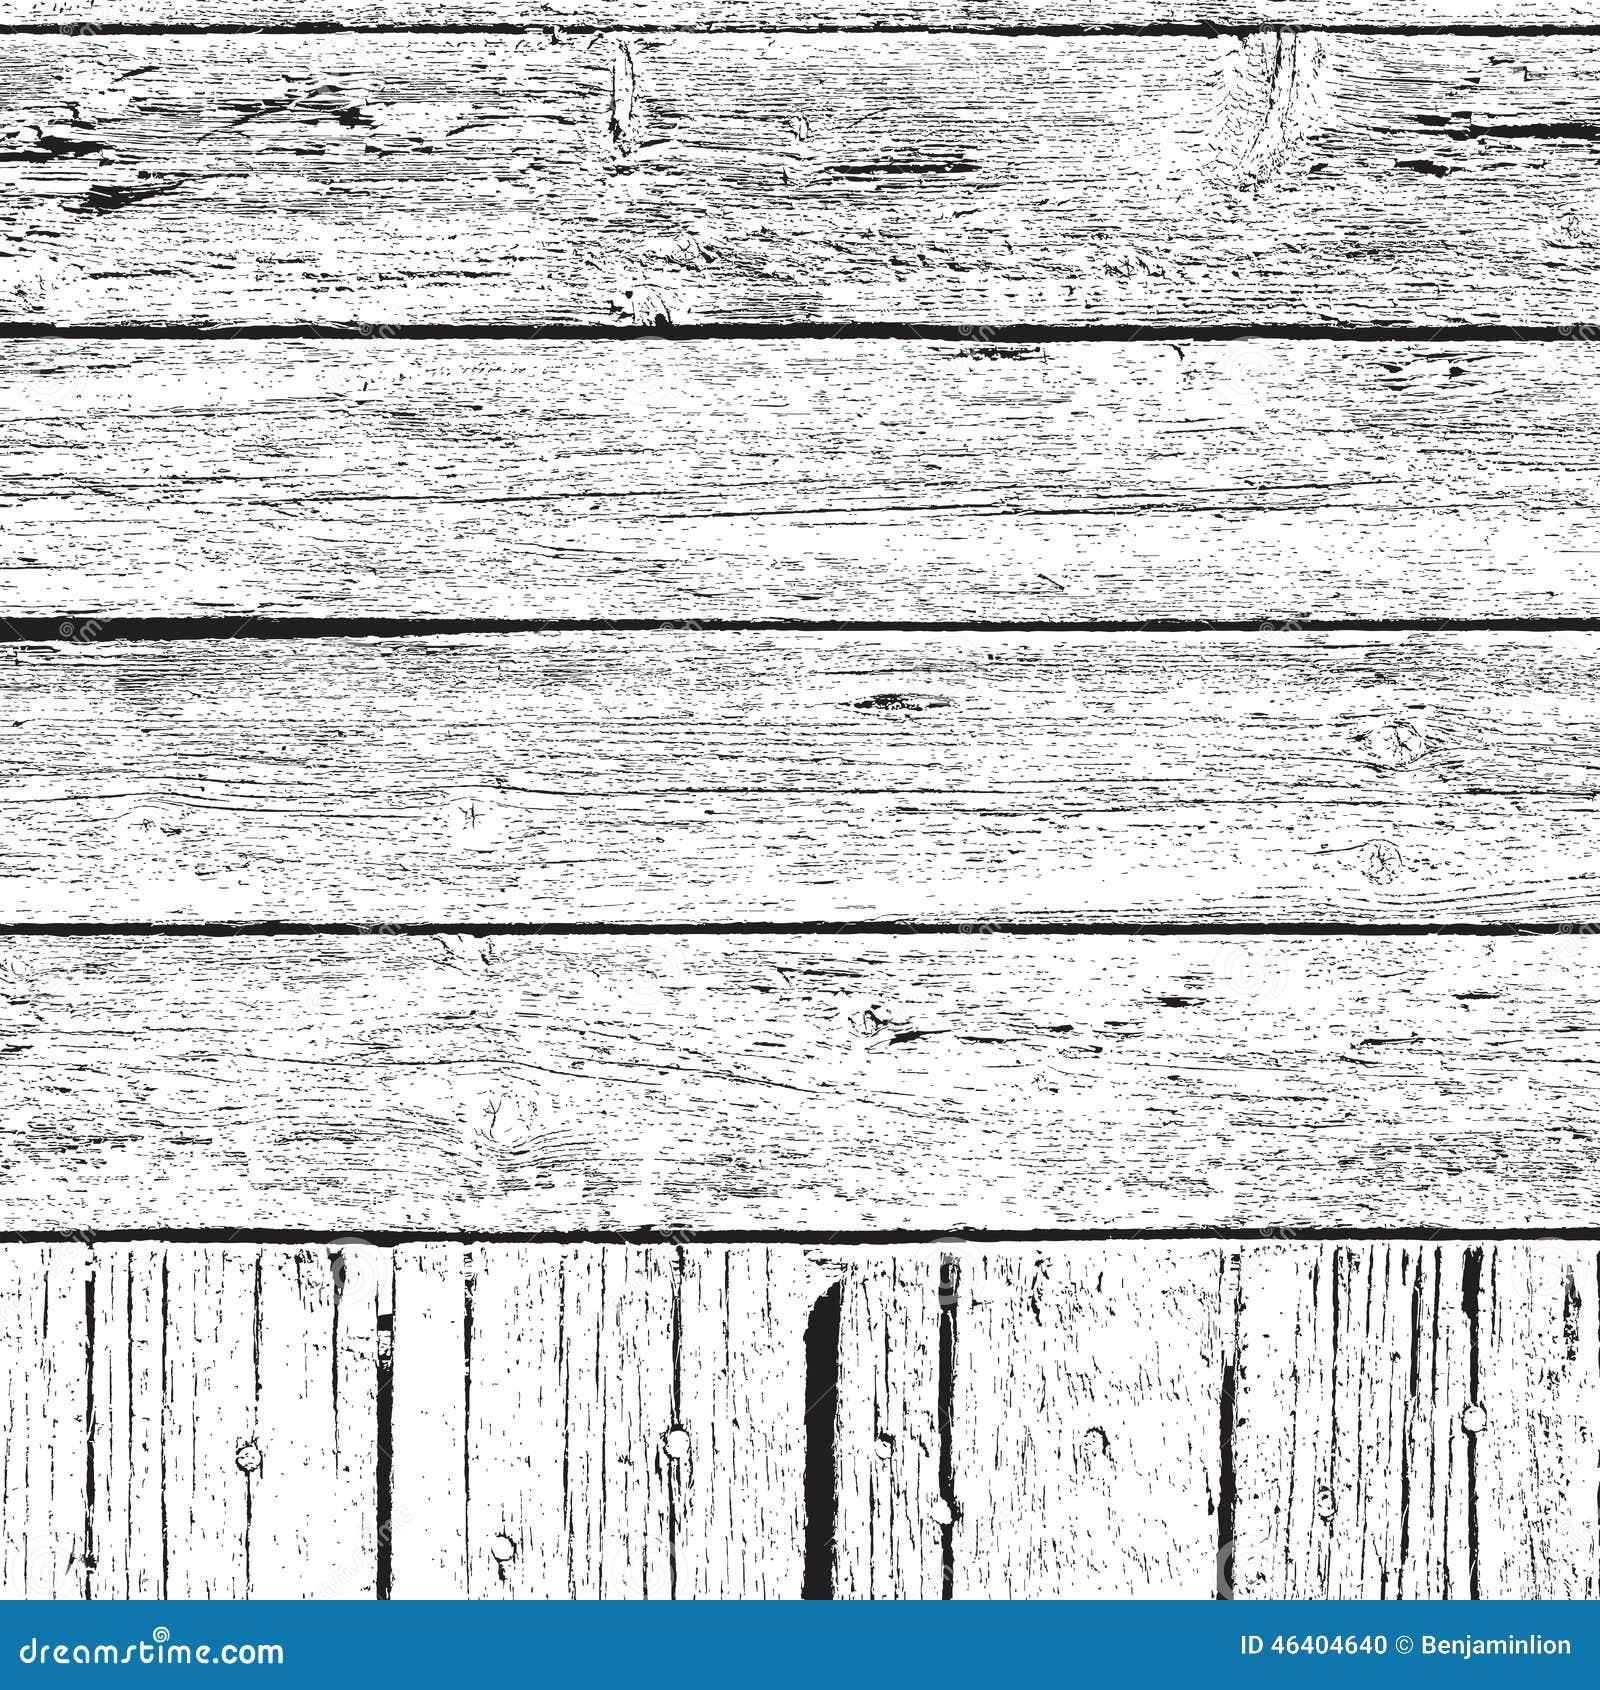 Uberlagerungs Landlicher Zaun Texture Vektor Abbildung